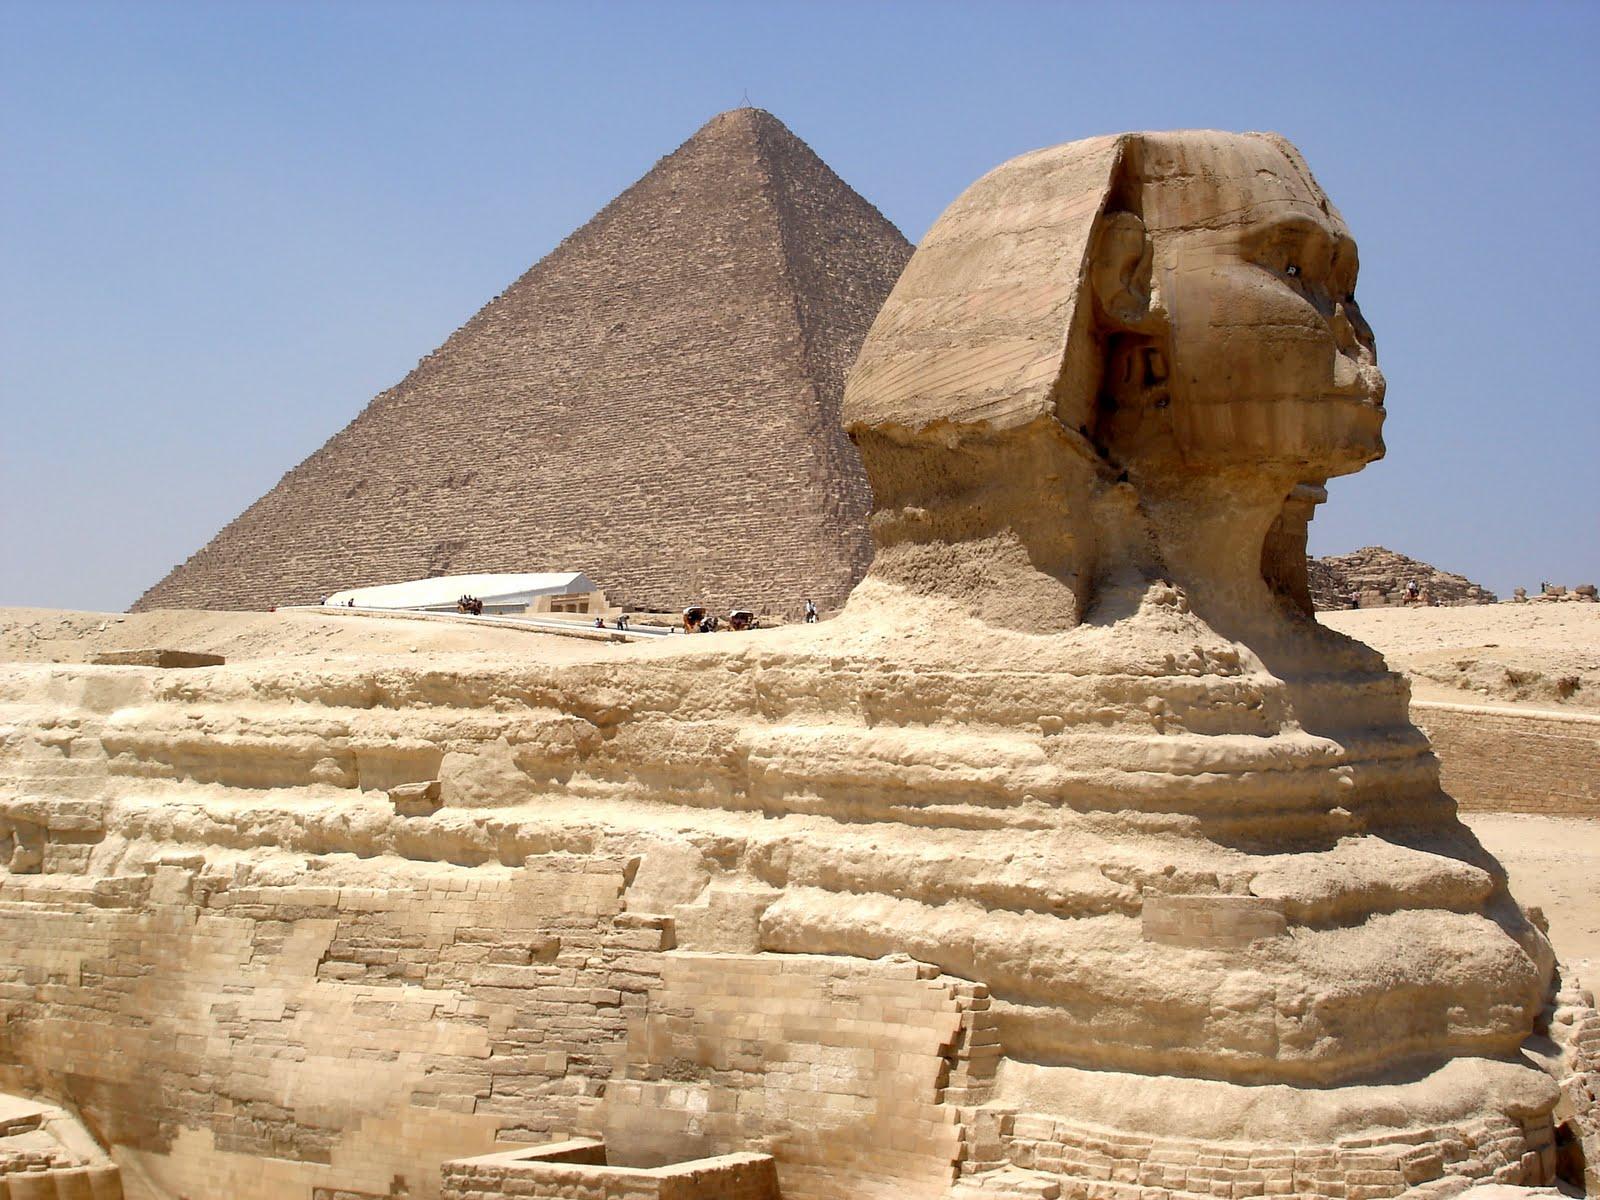 wallpaper egyptian pyramids wallpaper 7 egypt pyramid wallpapers 1600x1200